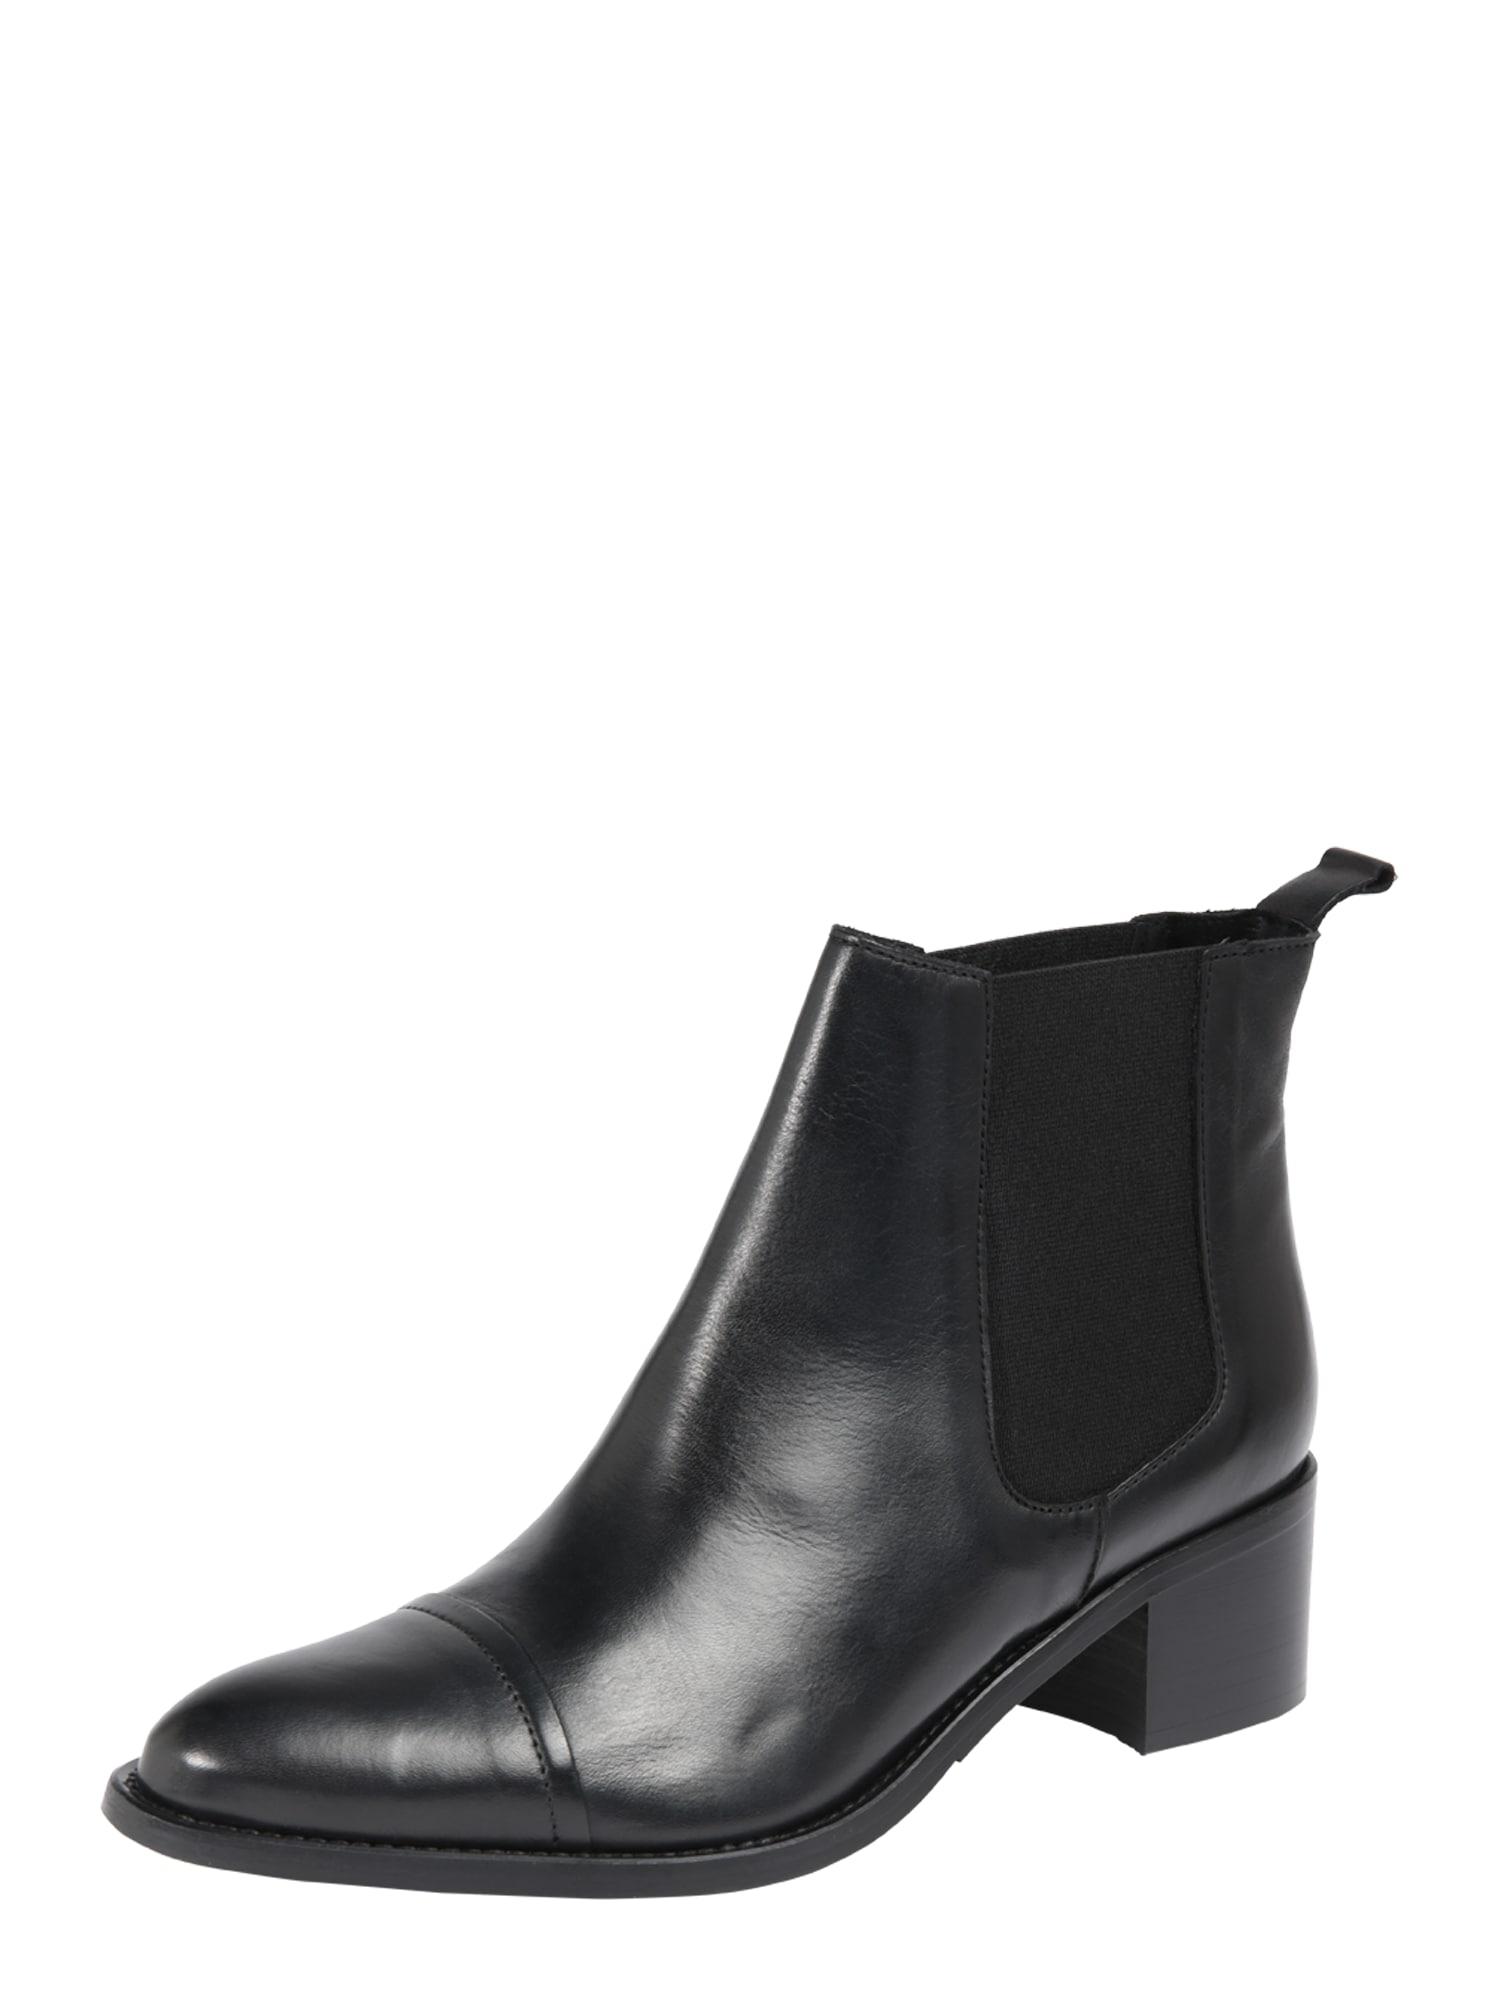 Chelsea boty Biacarol černá Bianco